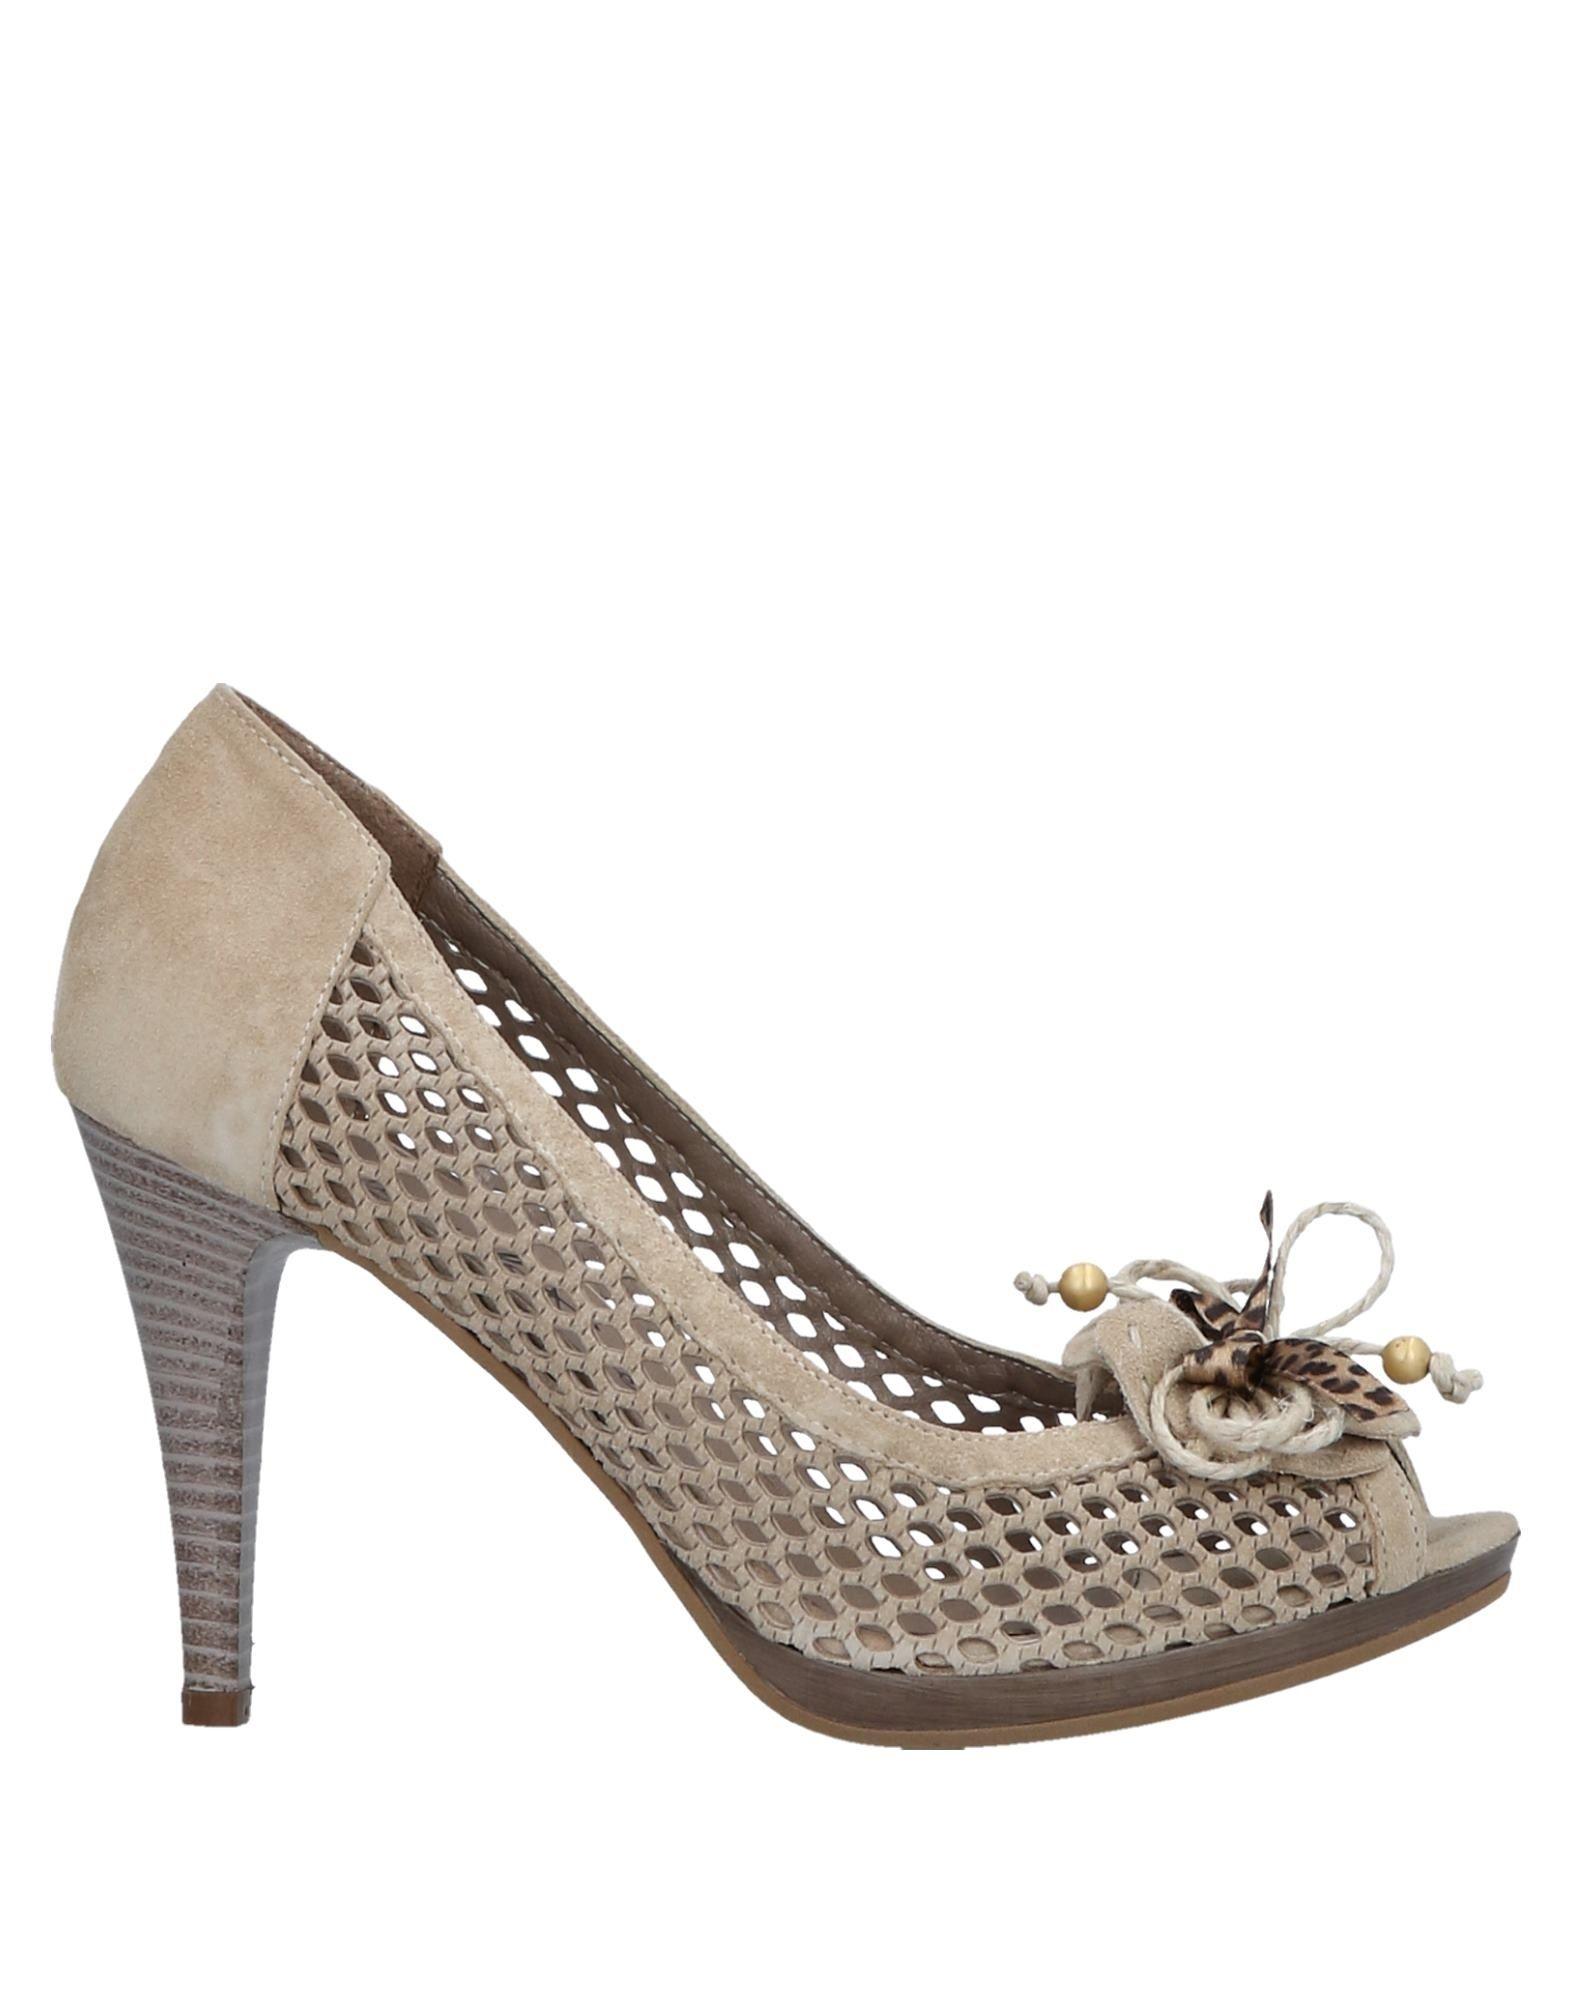 Emanuela Passeri Pumps Damen  11517887BG Gute Qualität beliebte Schuhe